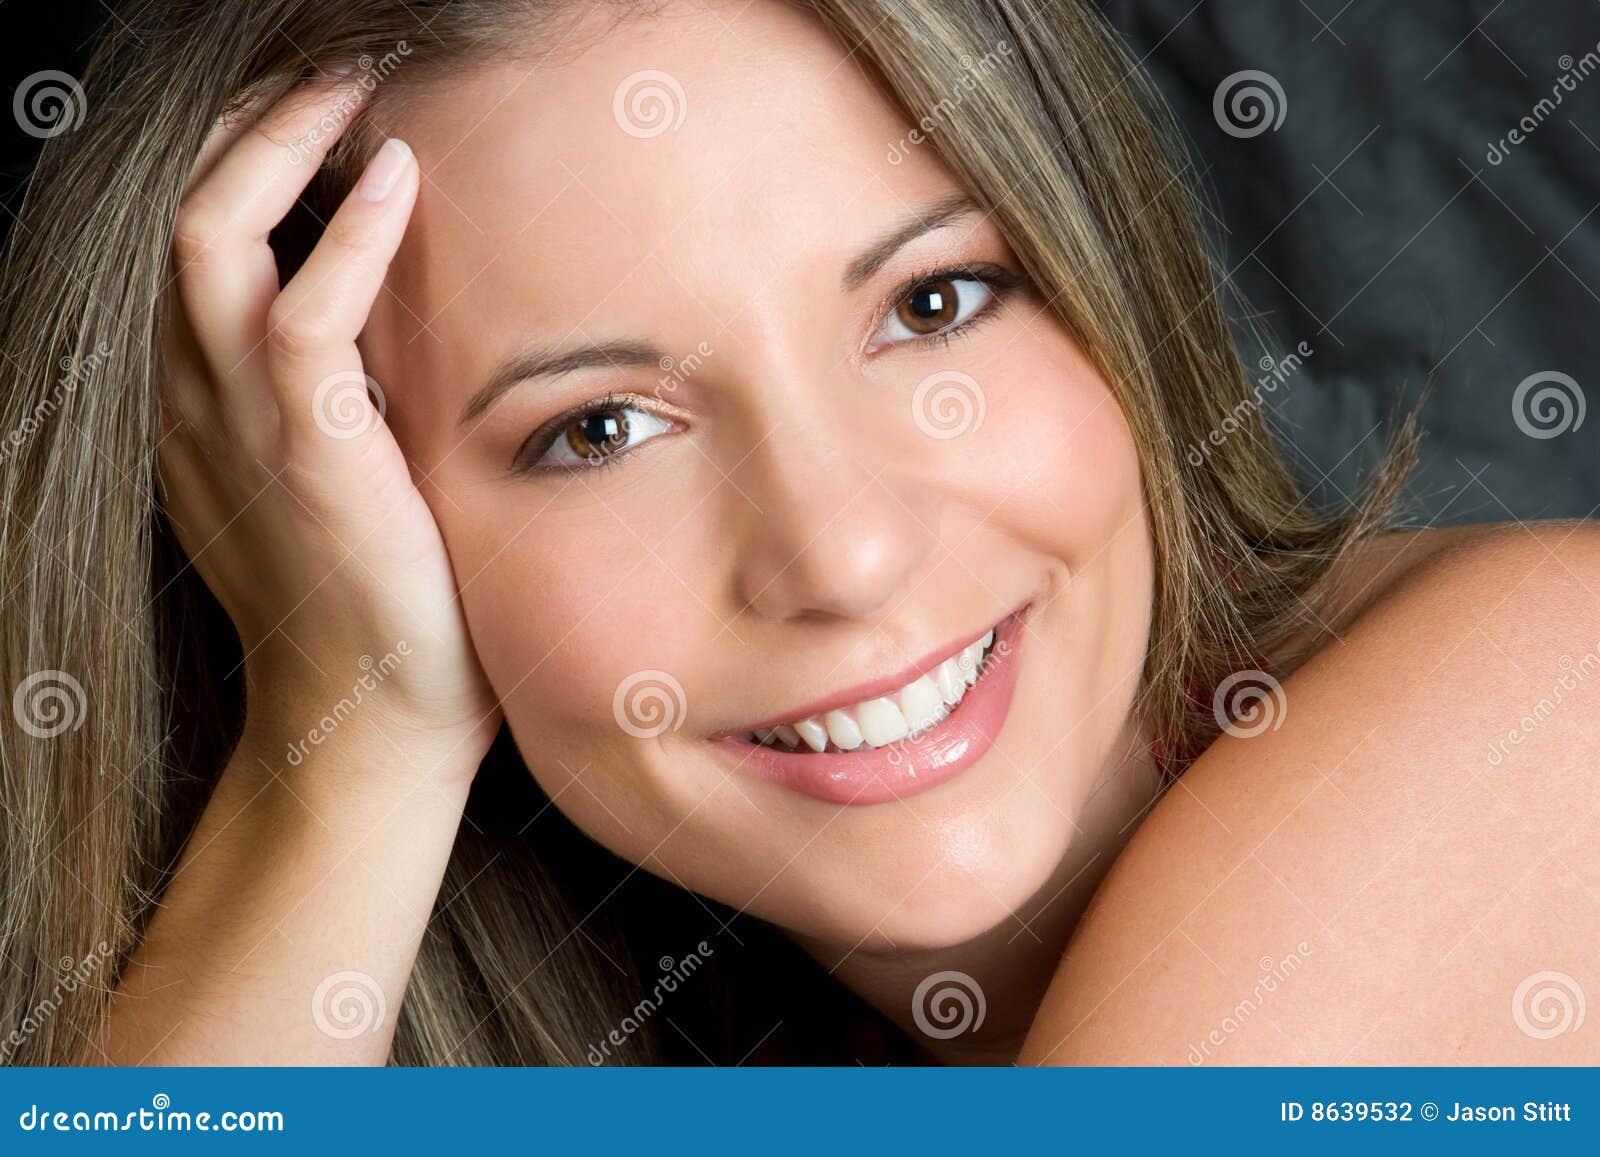 mulher-de-sorriso-lindo-8639532.jpg